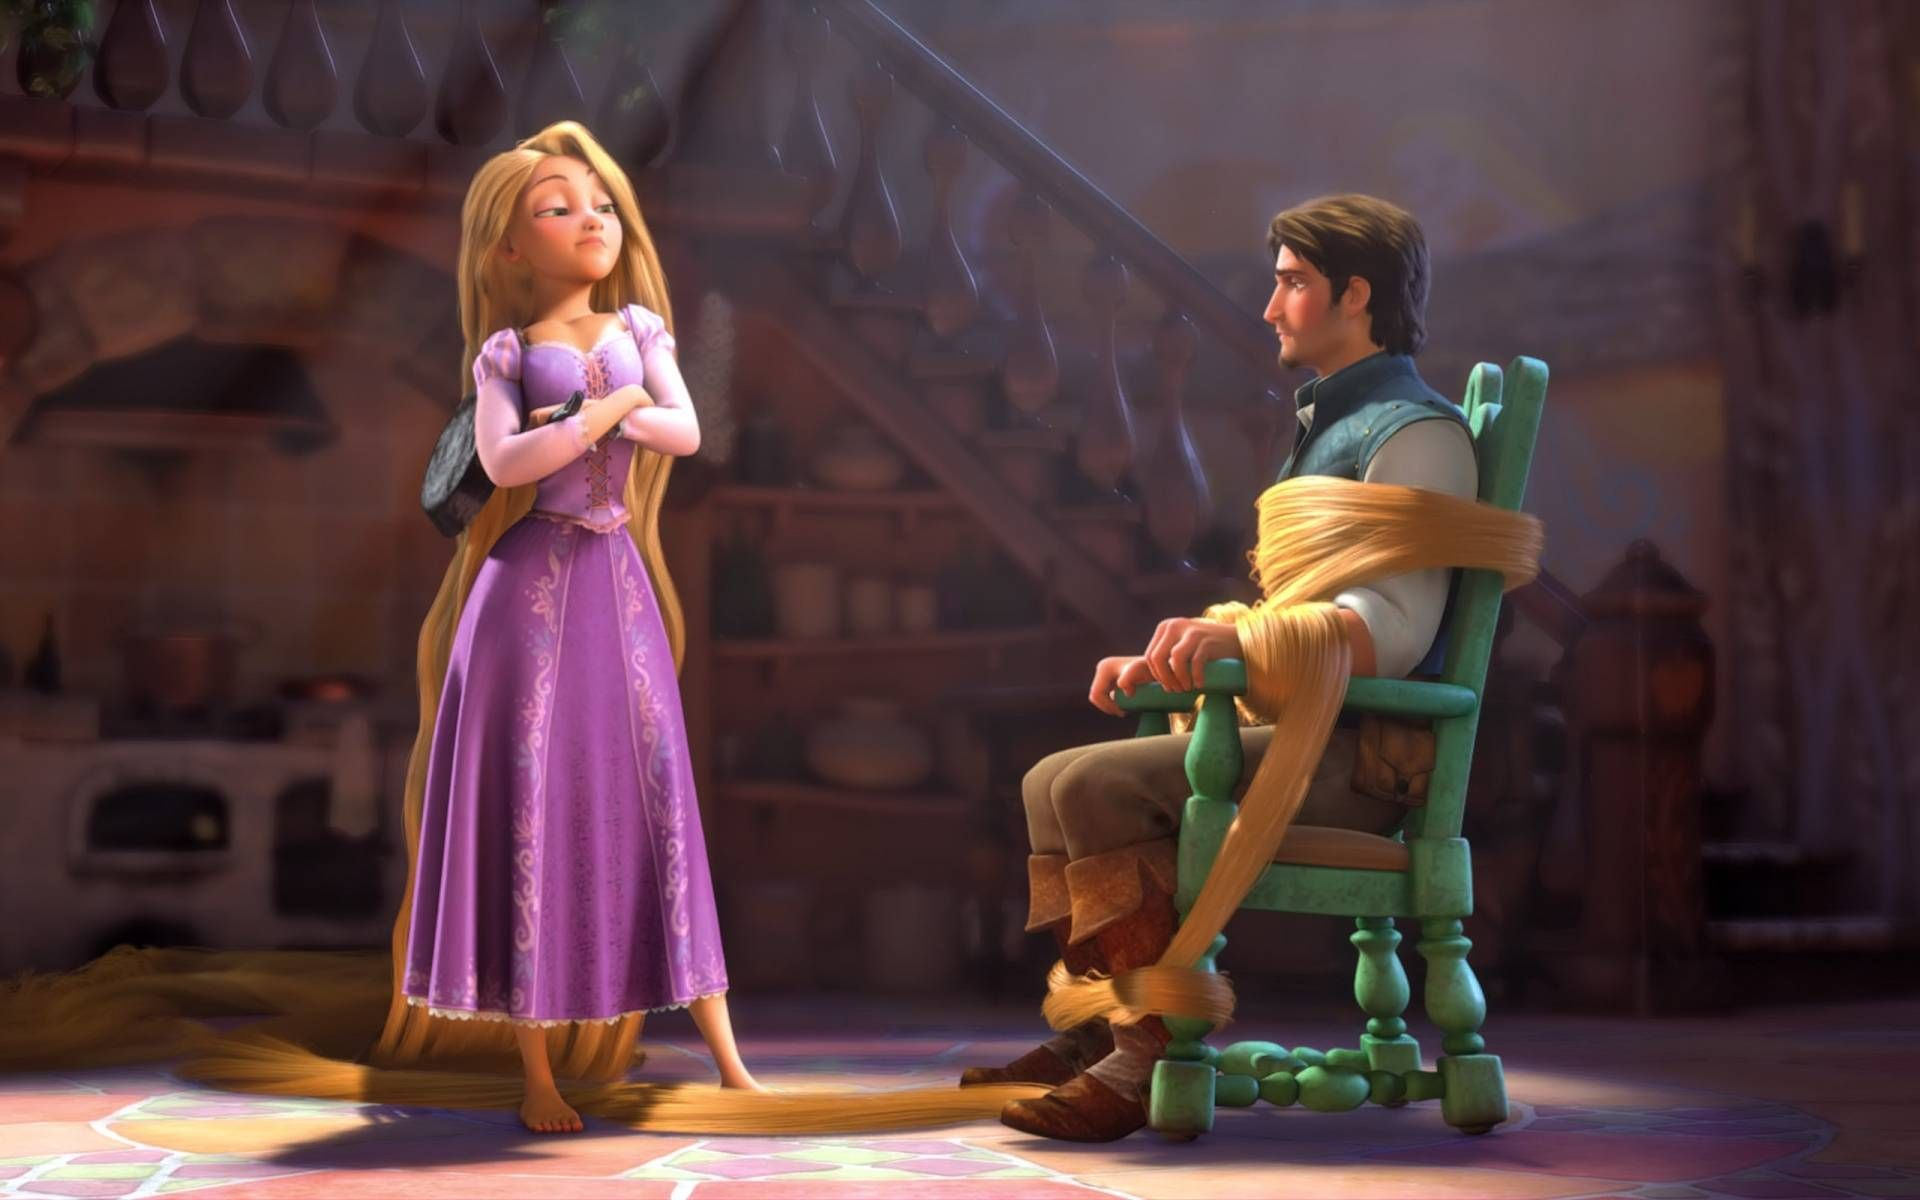 Tangled, Rapunzel and Flynn Rider